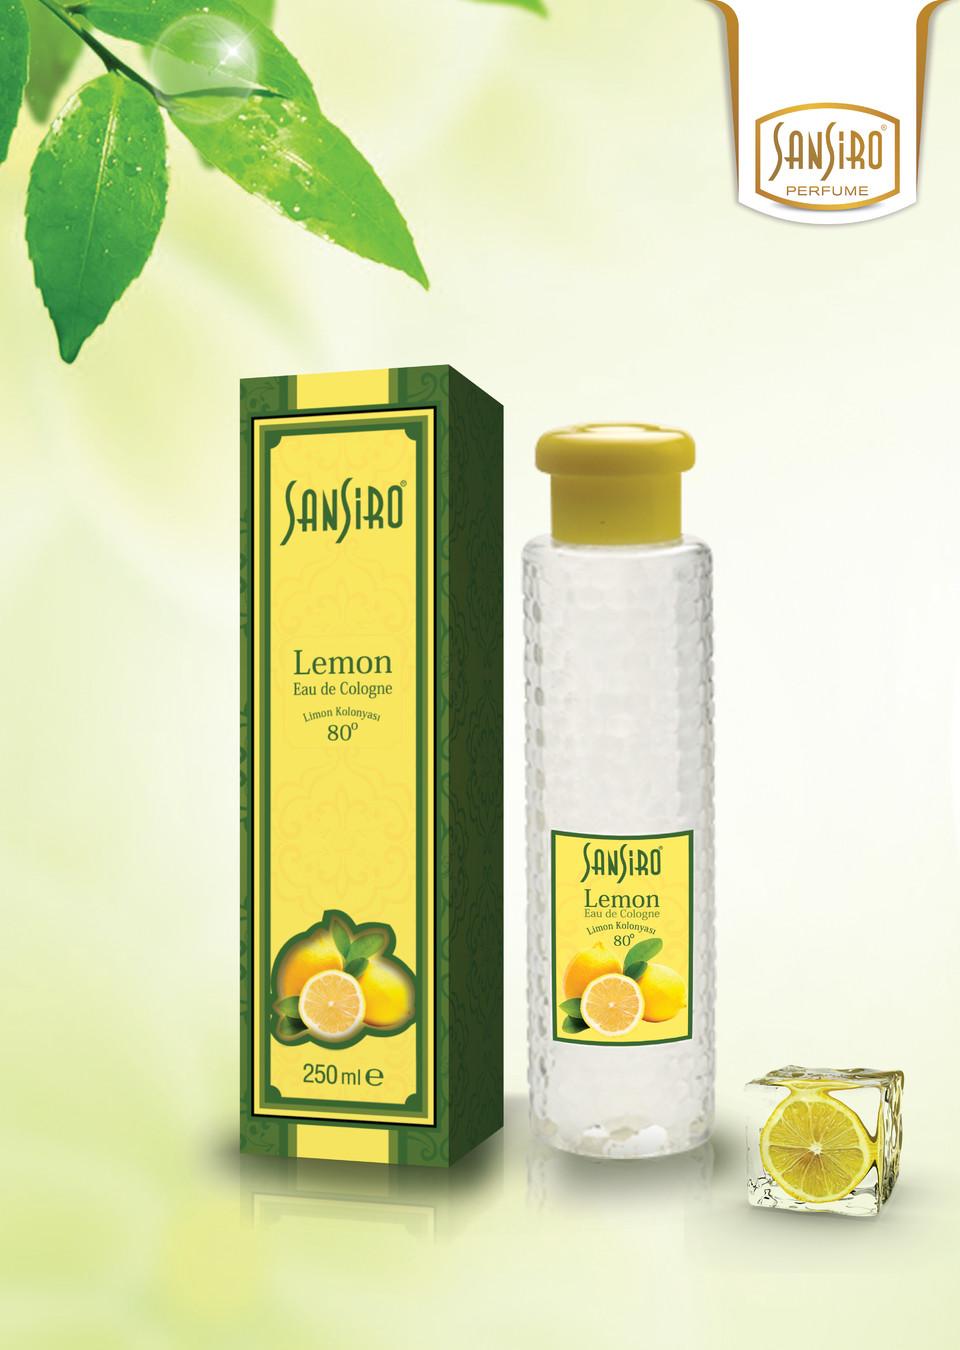 Sansiro Perfume - Sonstiges - Cologne Lemon